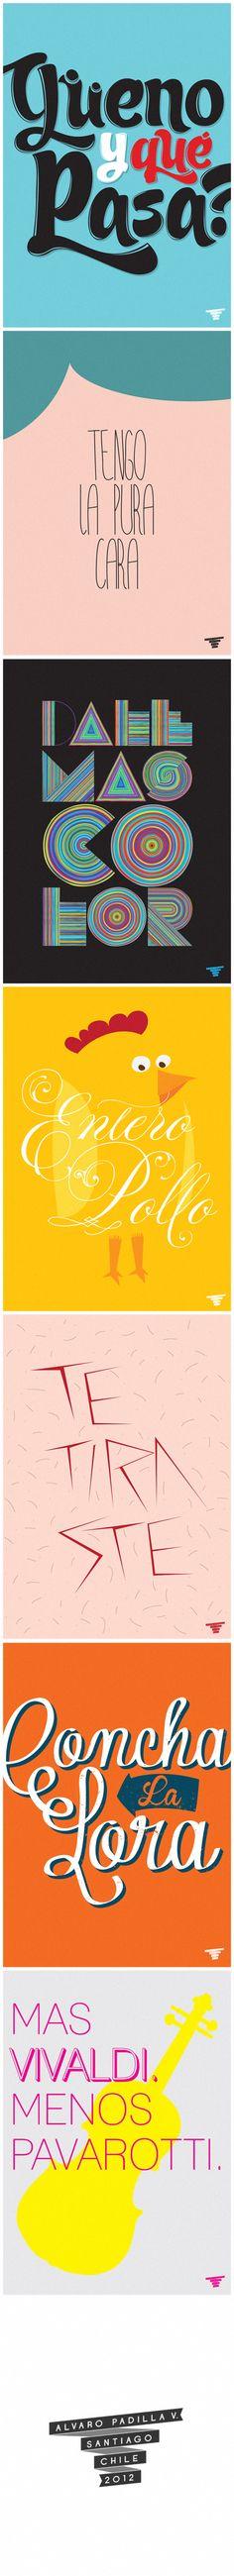 Afiches Flaites by Alvaro Padilla V.